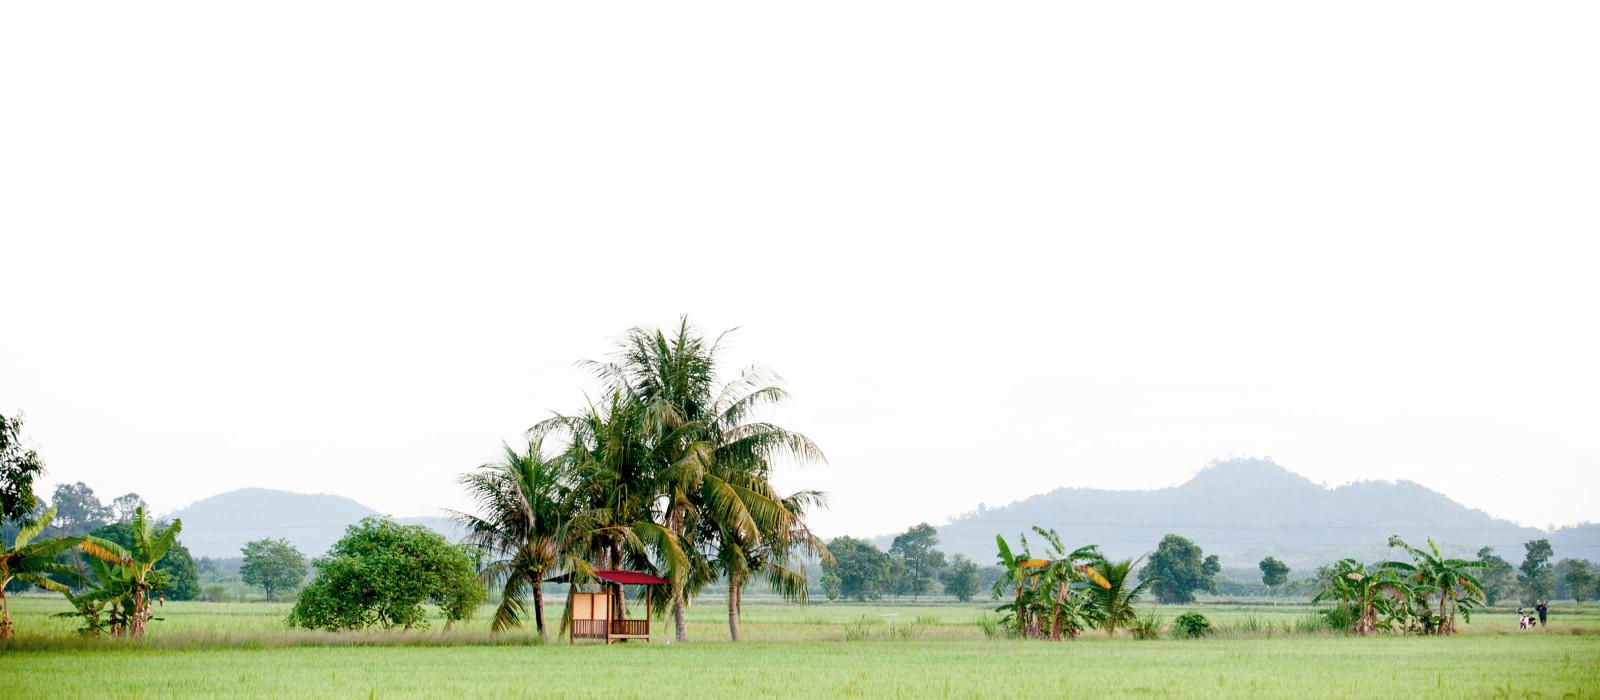 Panoramaaufnahme, Landschaft des Reisfeldes in Malaysia, Asien